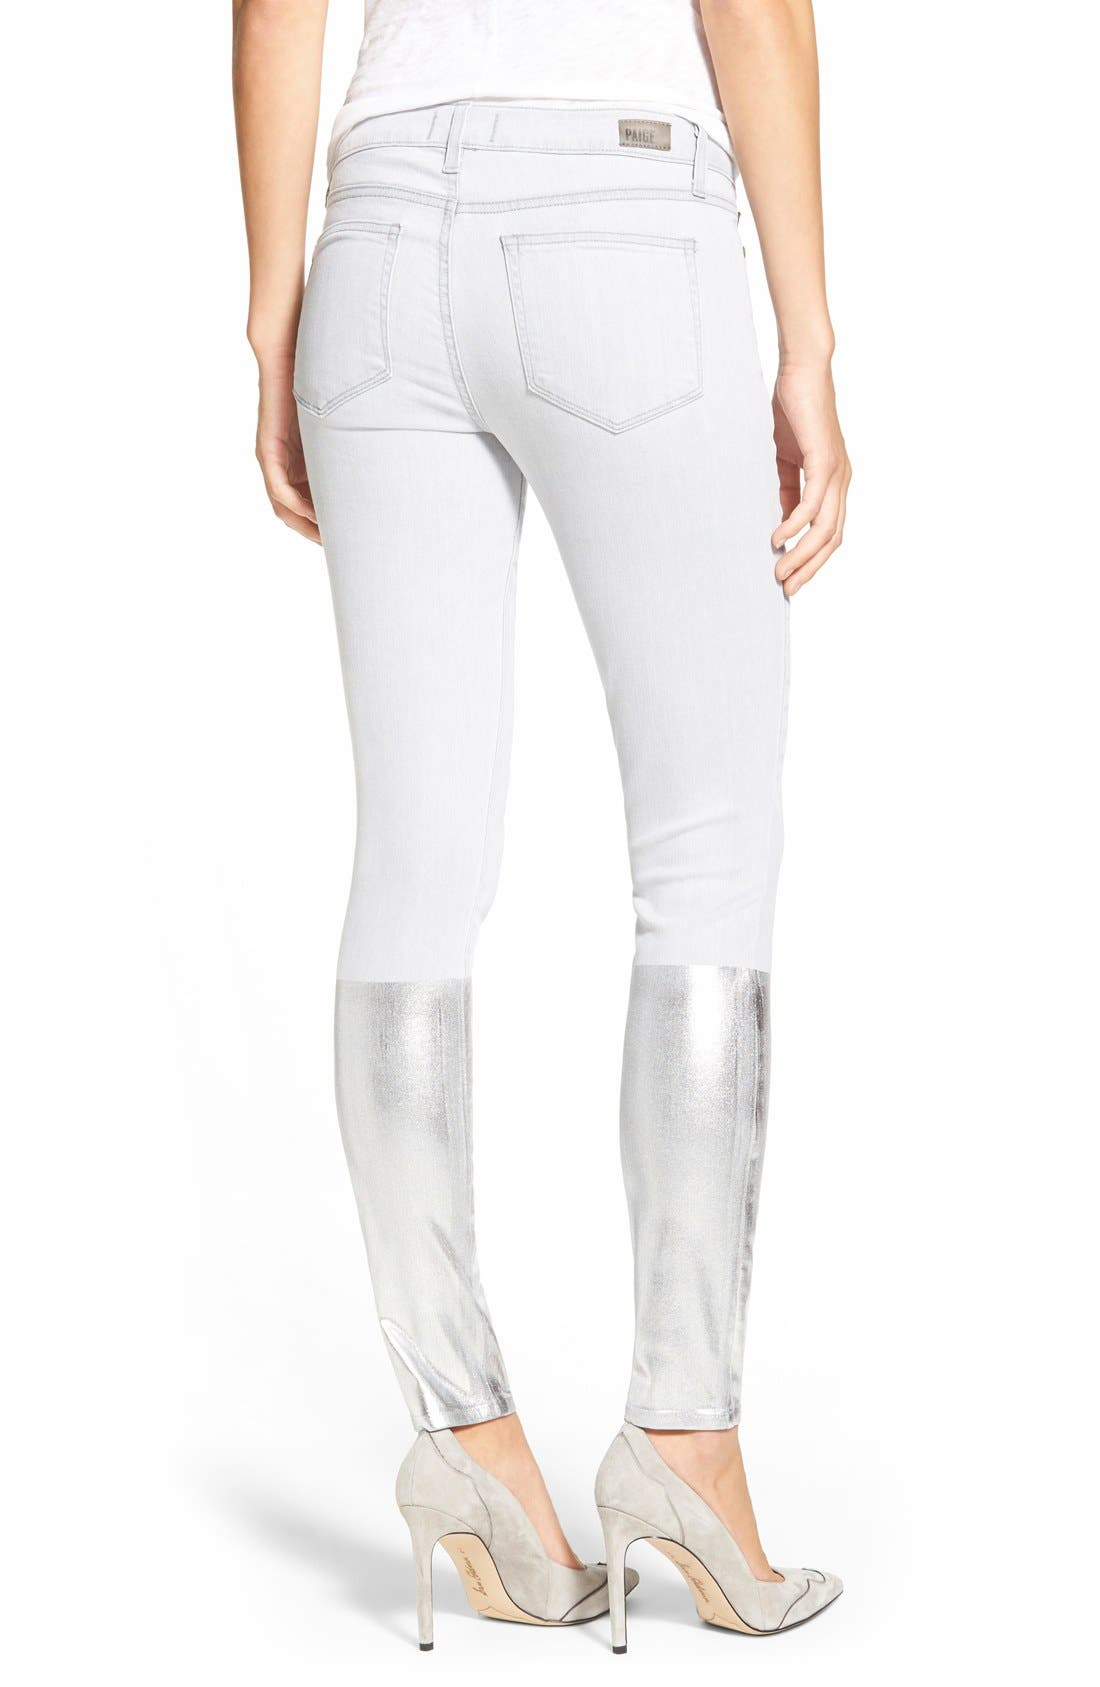 Alternate Image 3  - PaigeDenim 'Verdugo' Ankle Ultra Skinny Jeans (Light Grey/Silver Solstice)